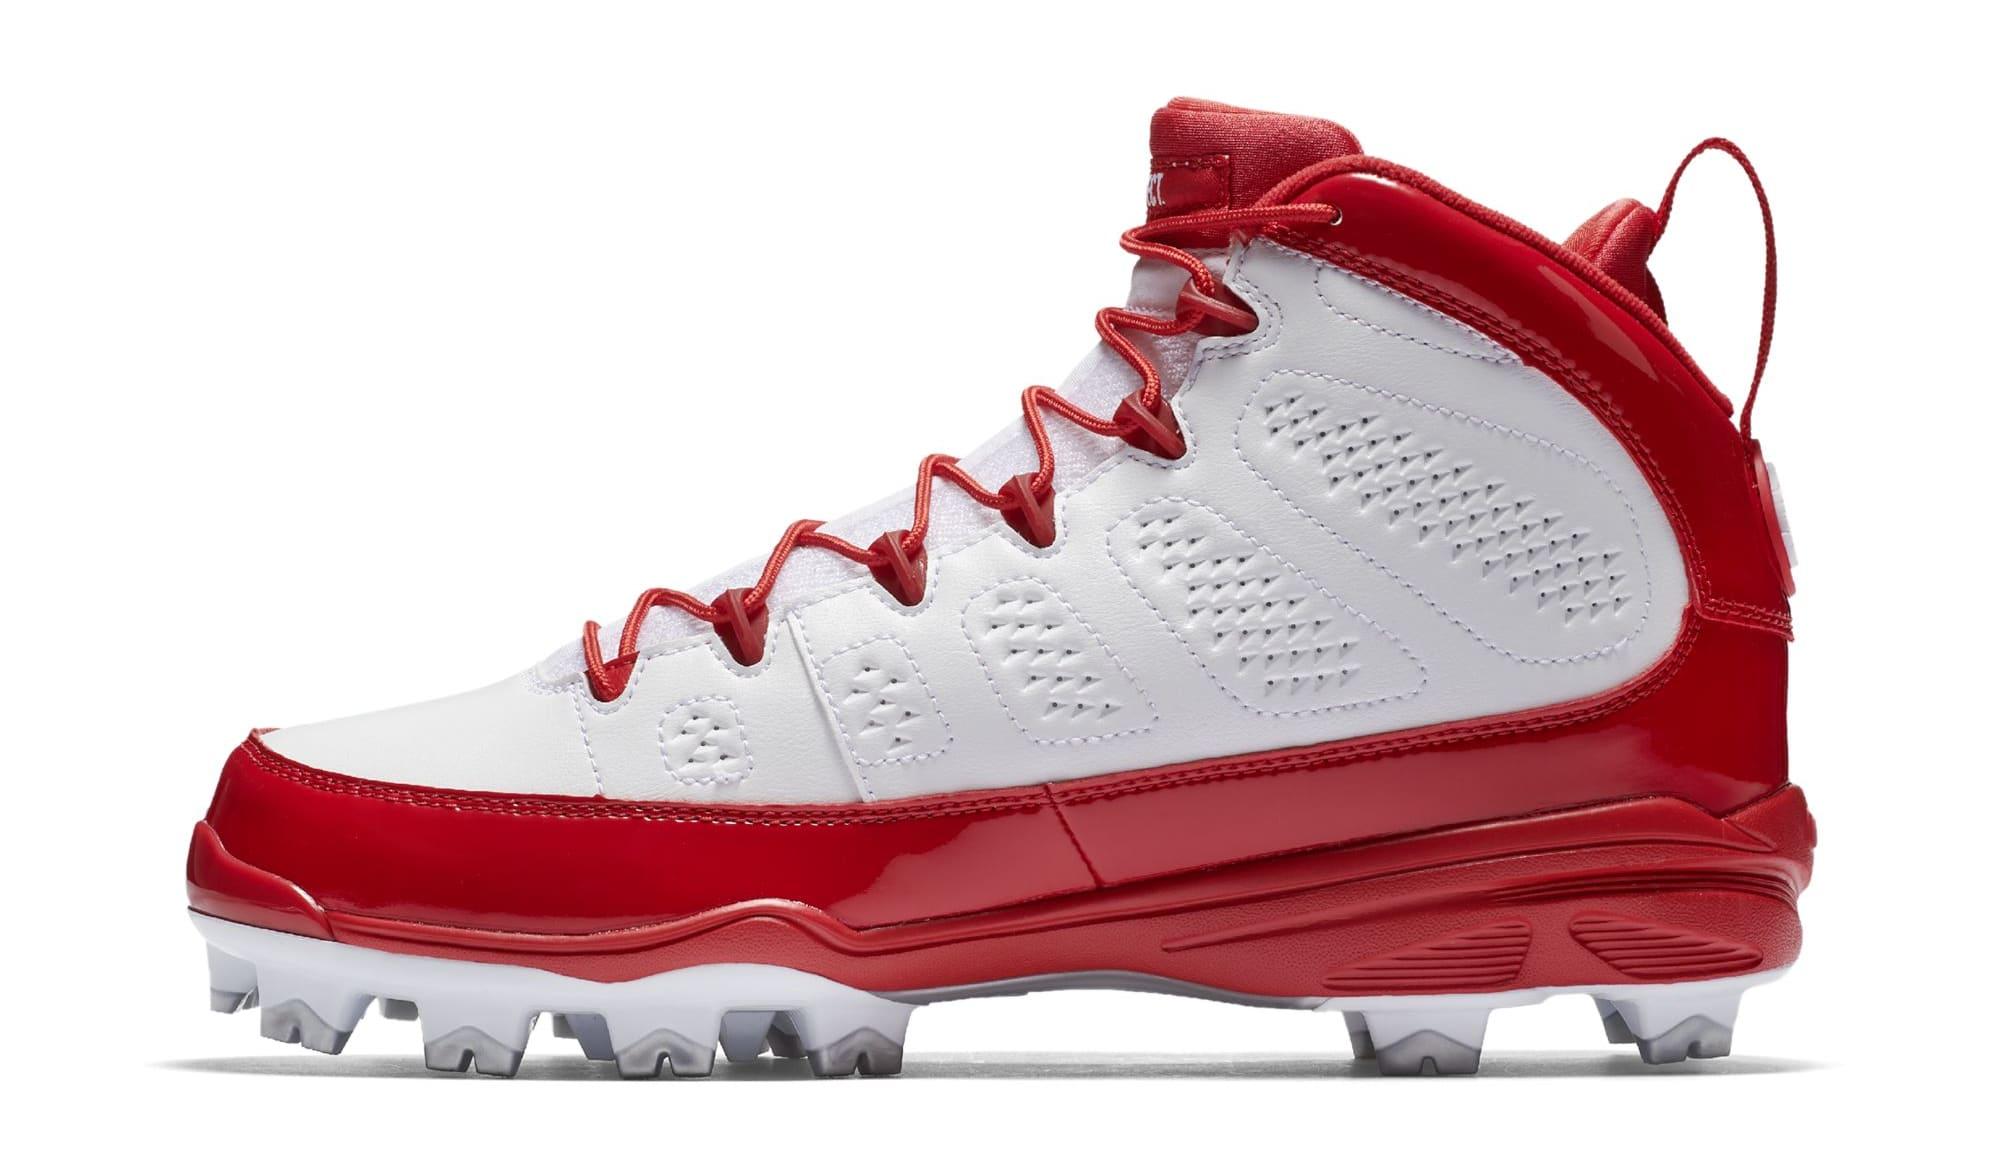 ... Air Jordan 9 IX MCS Baseball Cleats Red Medial